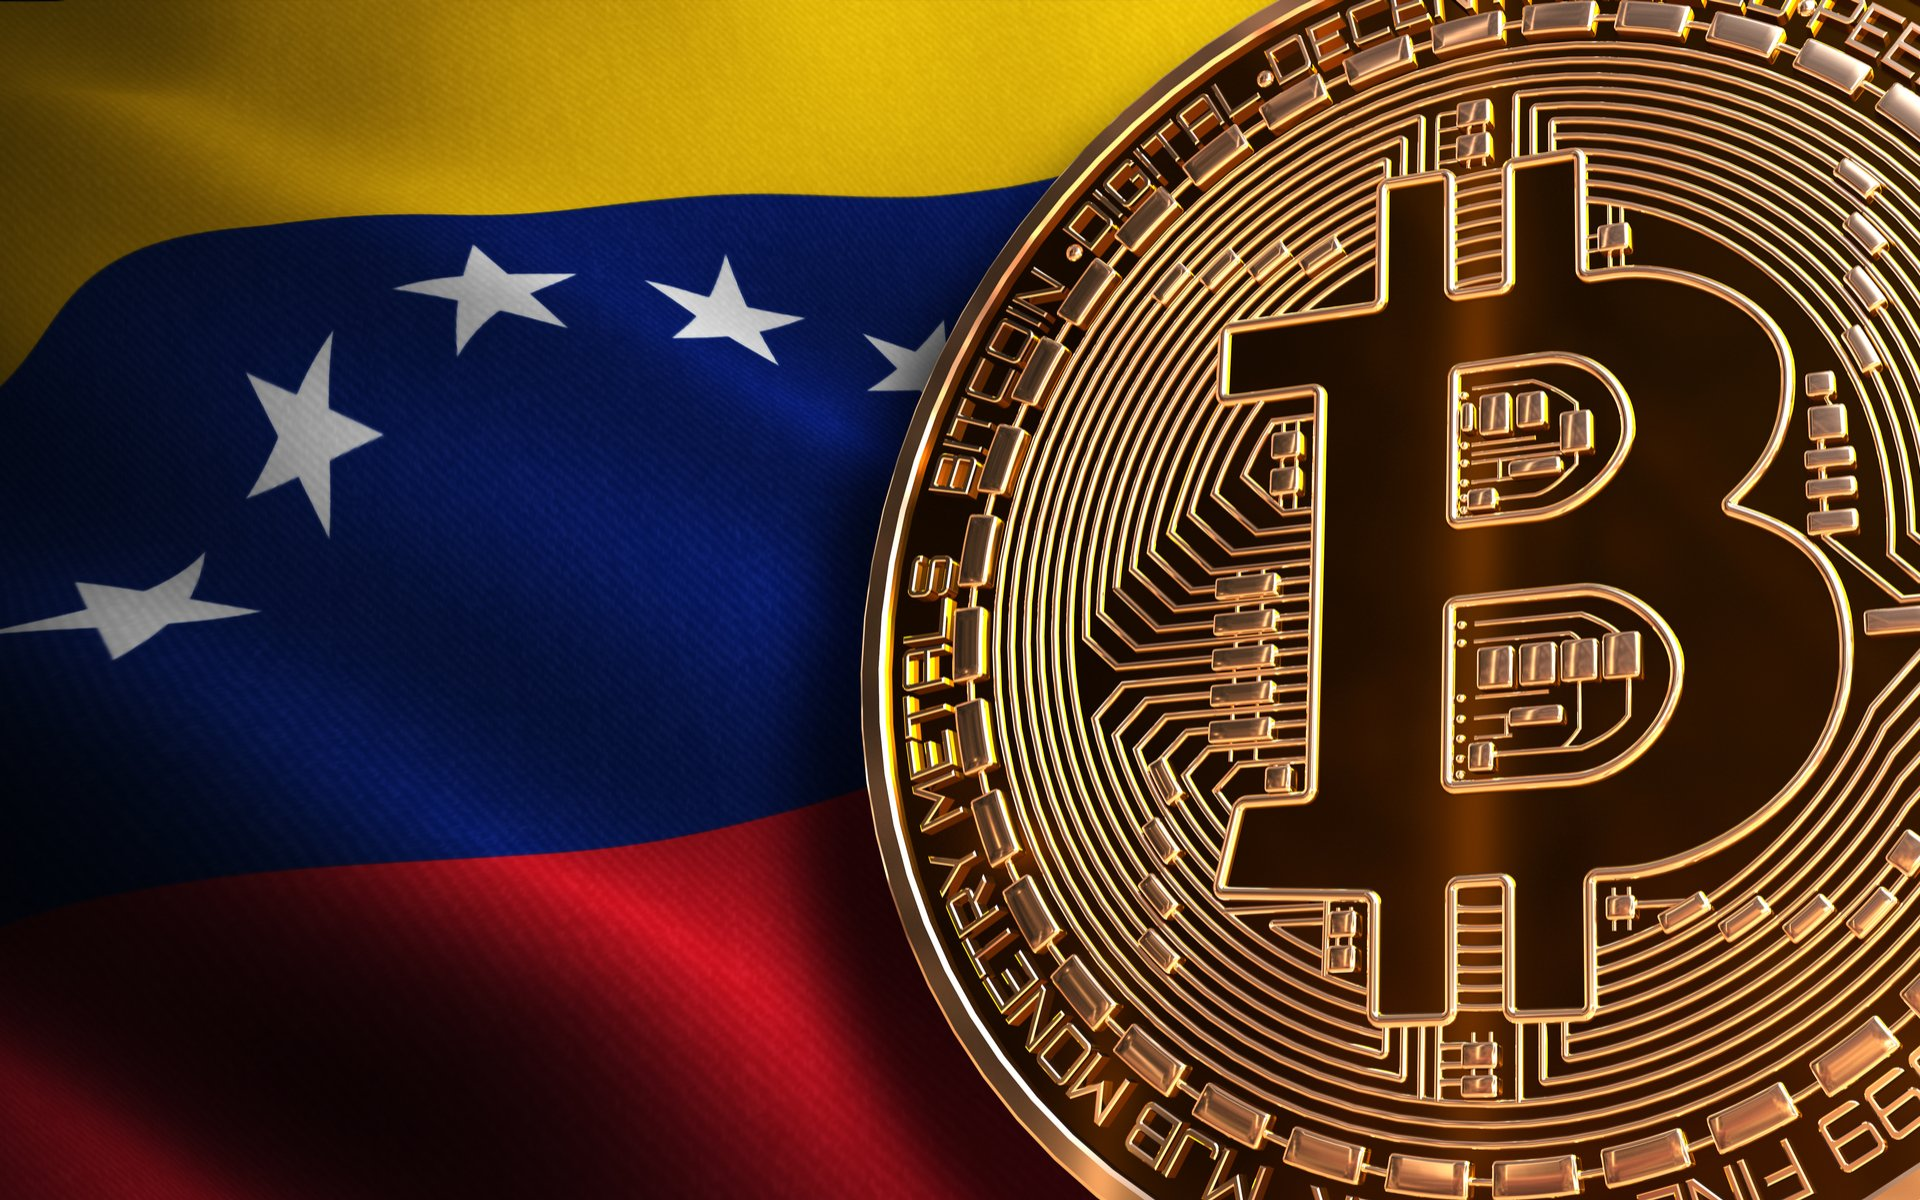 2 7 Trillion Bolivars Venezuela Bitcoin Trading Hits All Time High